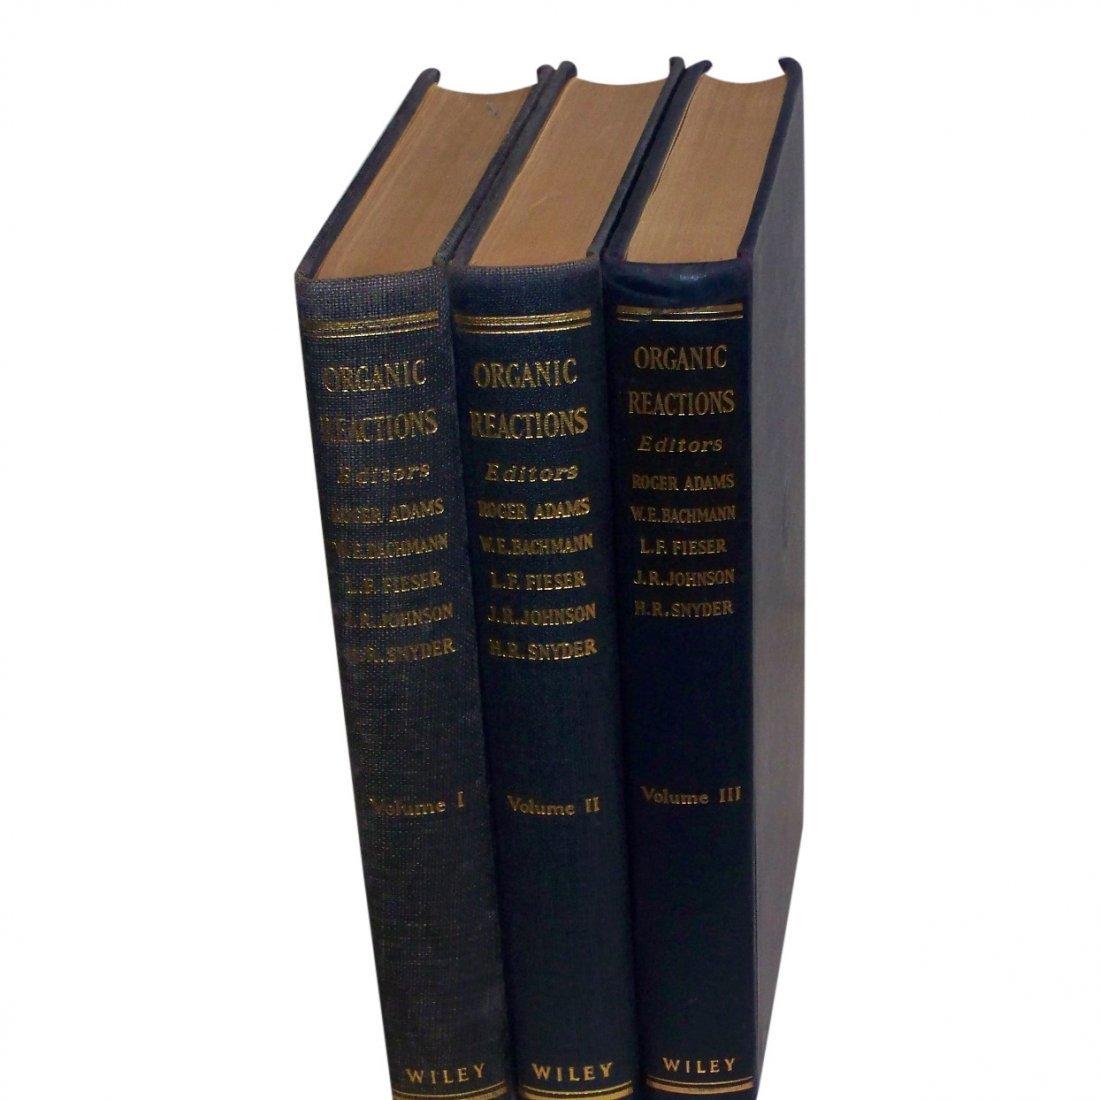 Organic Reactions 3 Volumes